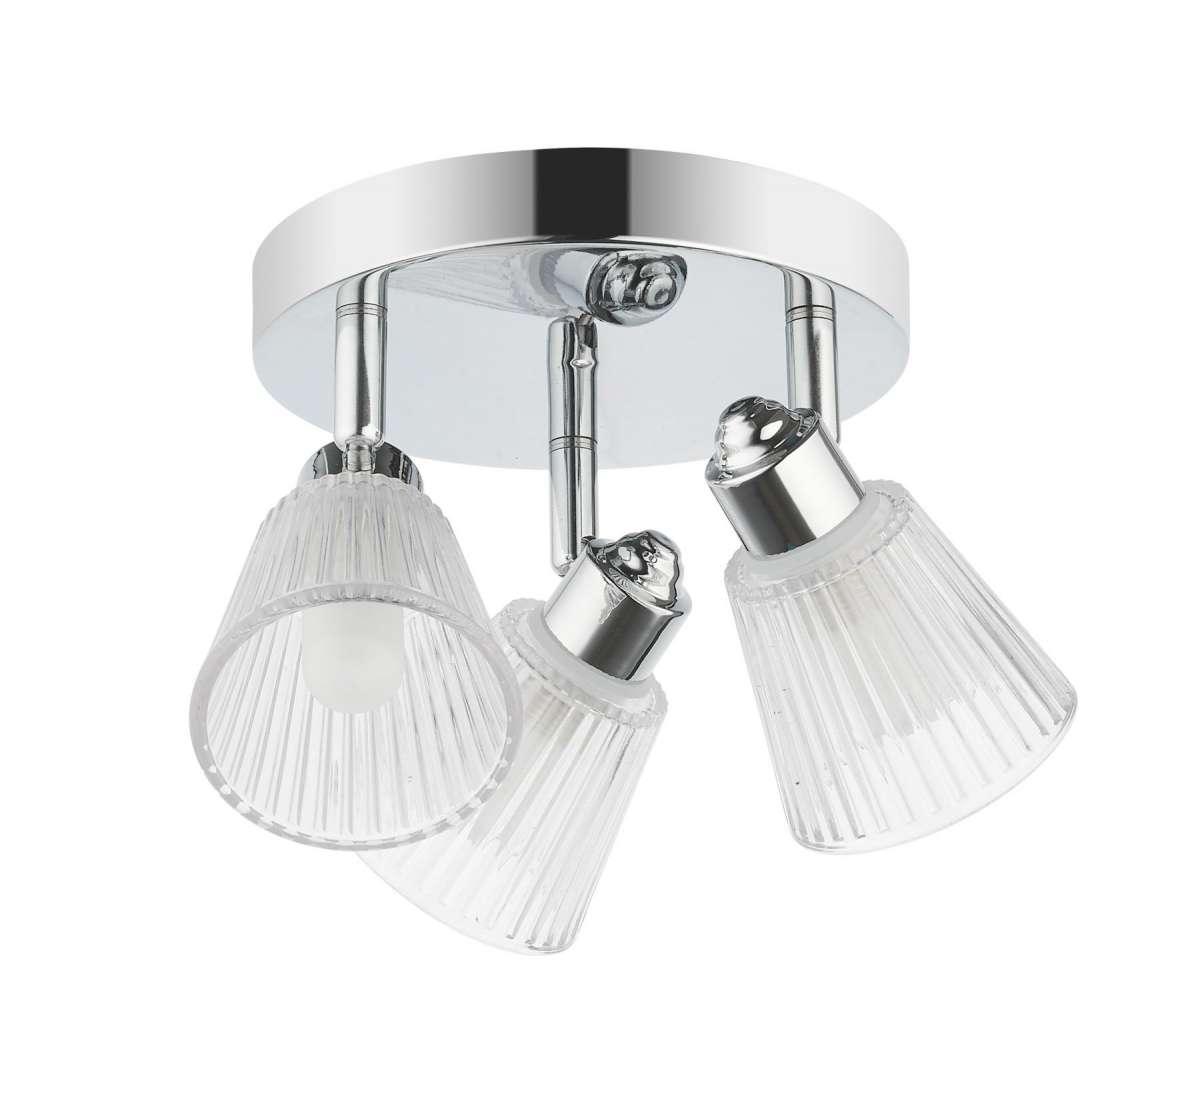 Gatsby 3 Light Bathroom Ceiling Light Polished Chrome